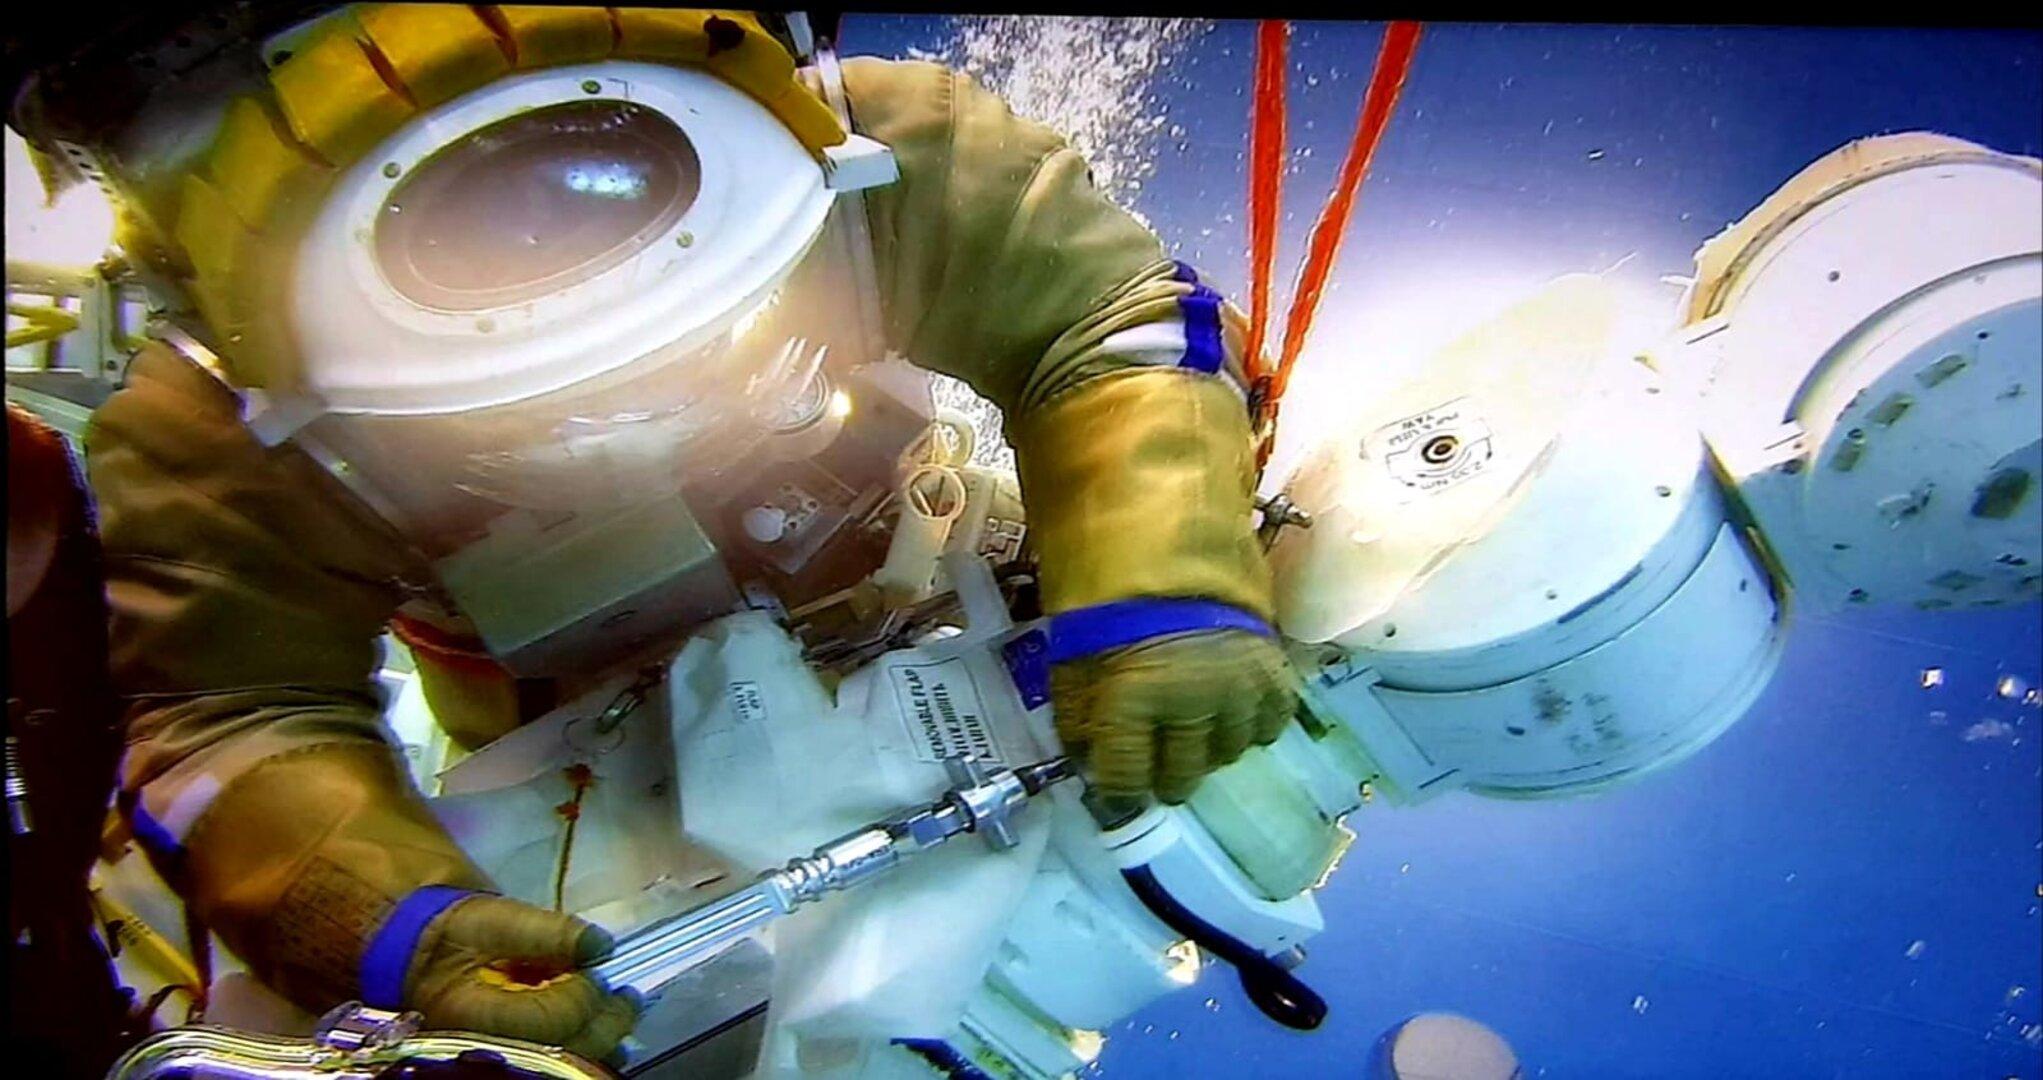 Les futurs équipages vers l'ISS - Page 21 E5HacRoWYAMsPL0?format=jpg&name=large